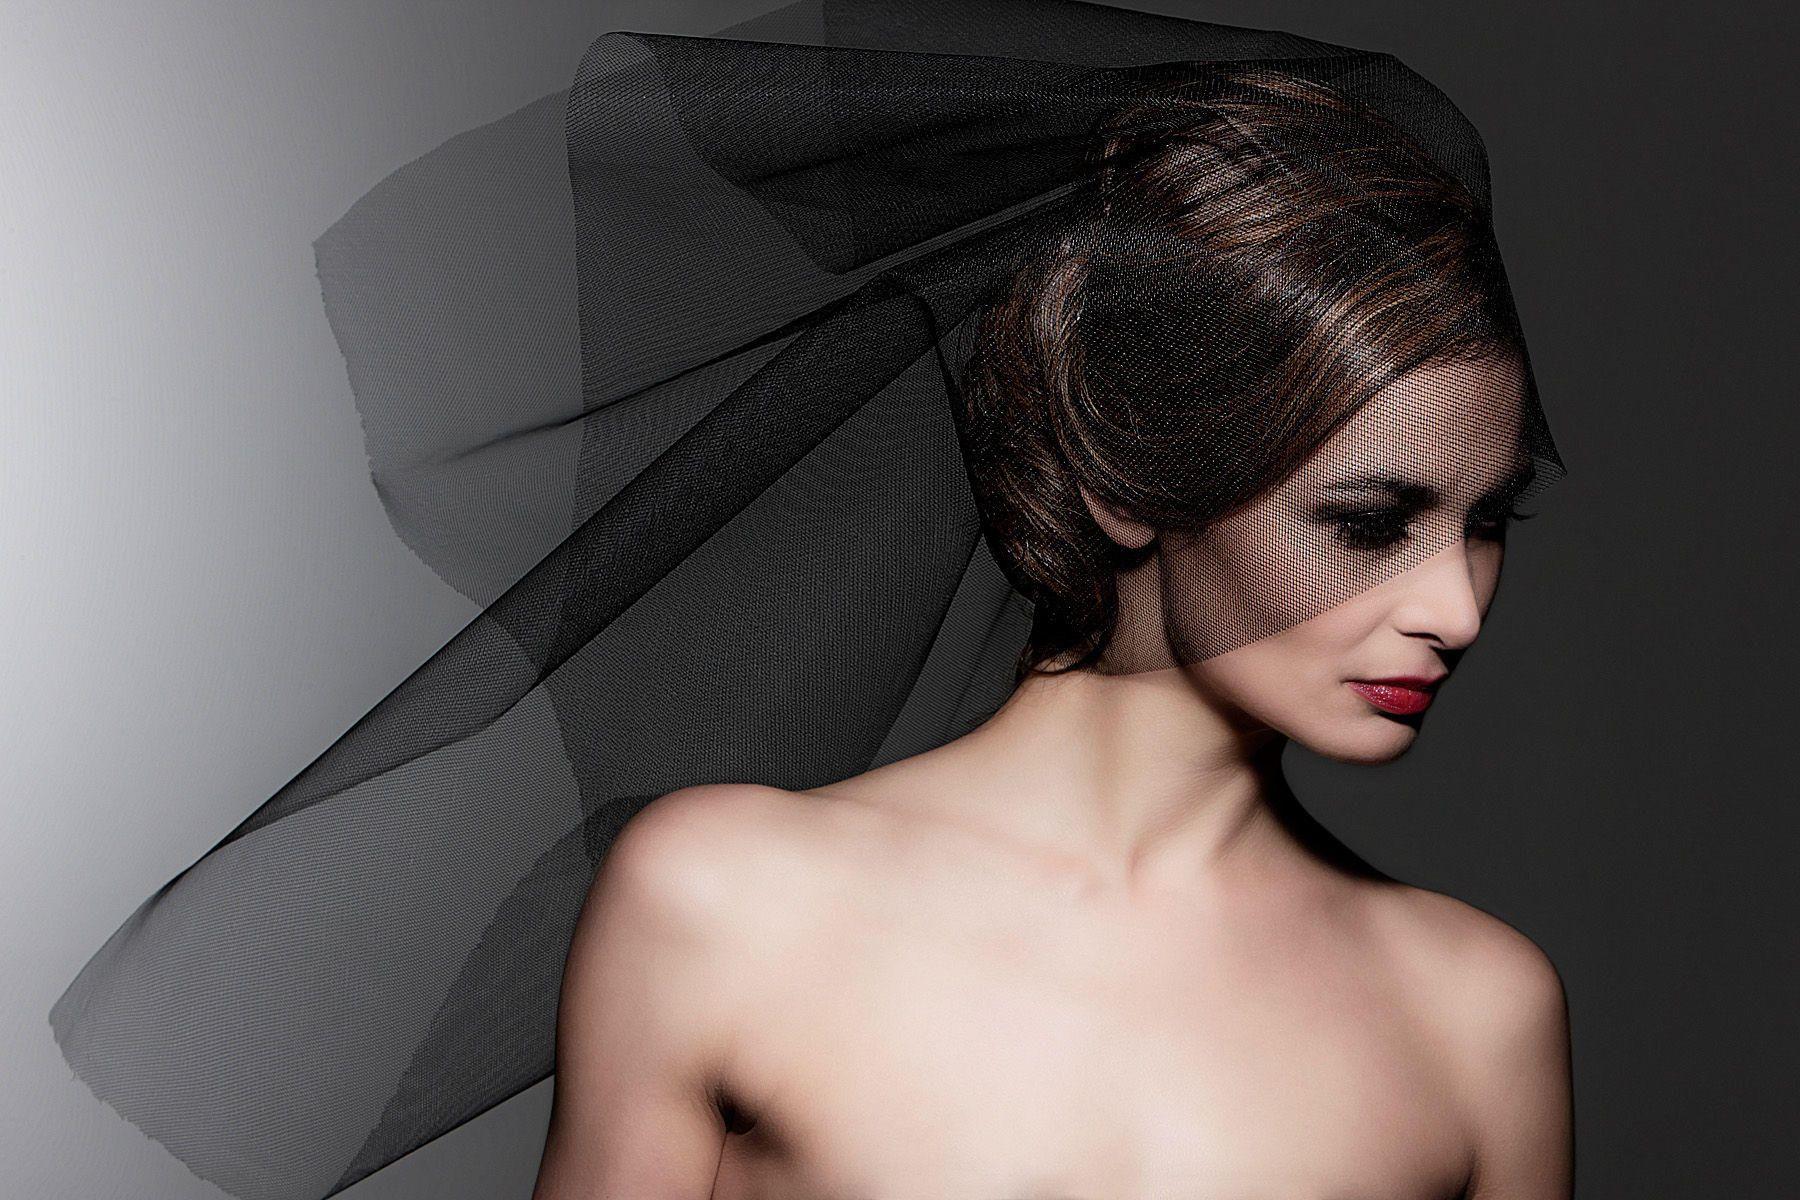 1brian_demello_photography_advertising_product_food_liquids_beverage_portrait_beauty_athletic_sports_0421_aj_189_copy.jpg